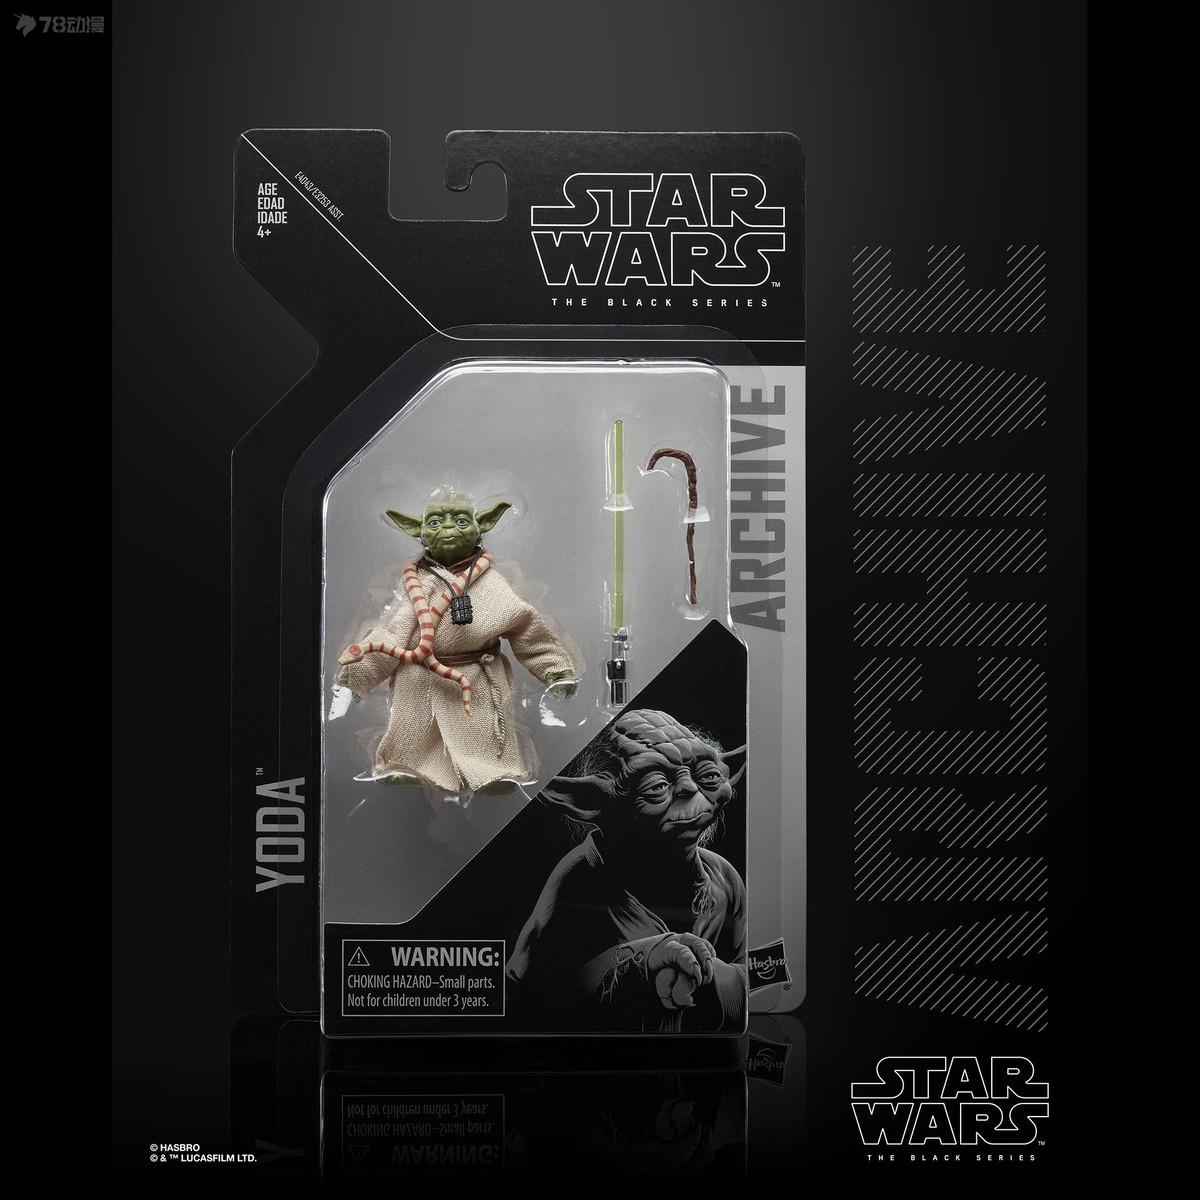 E4043_Star_Wars_The_Black_Series_Archive_Yoda_Figure_2_2000x.jpg